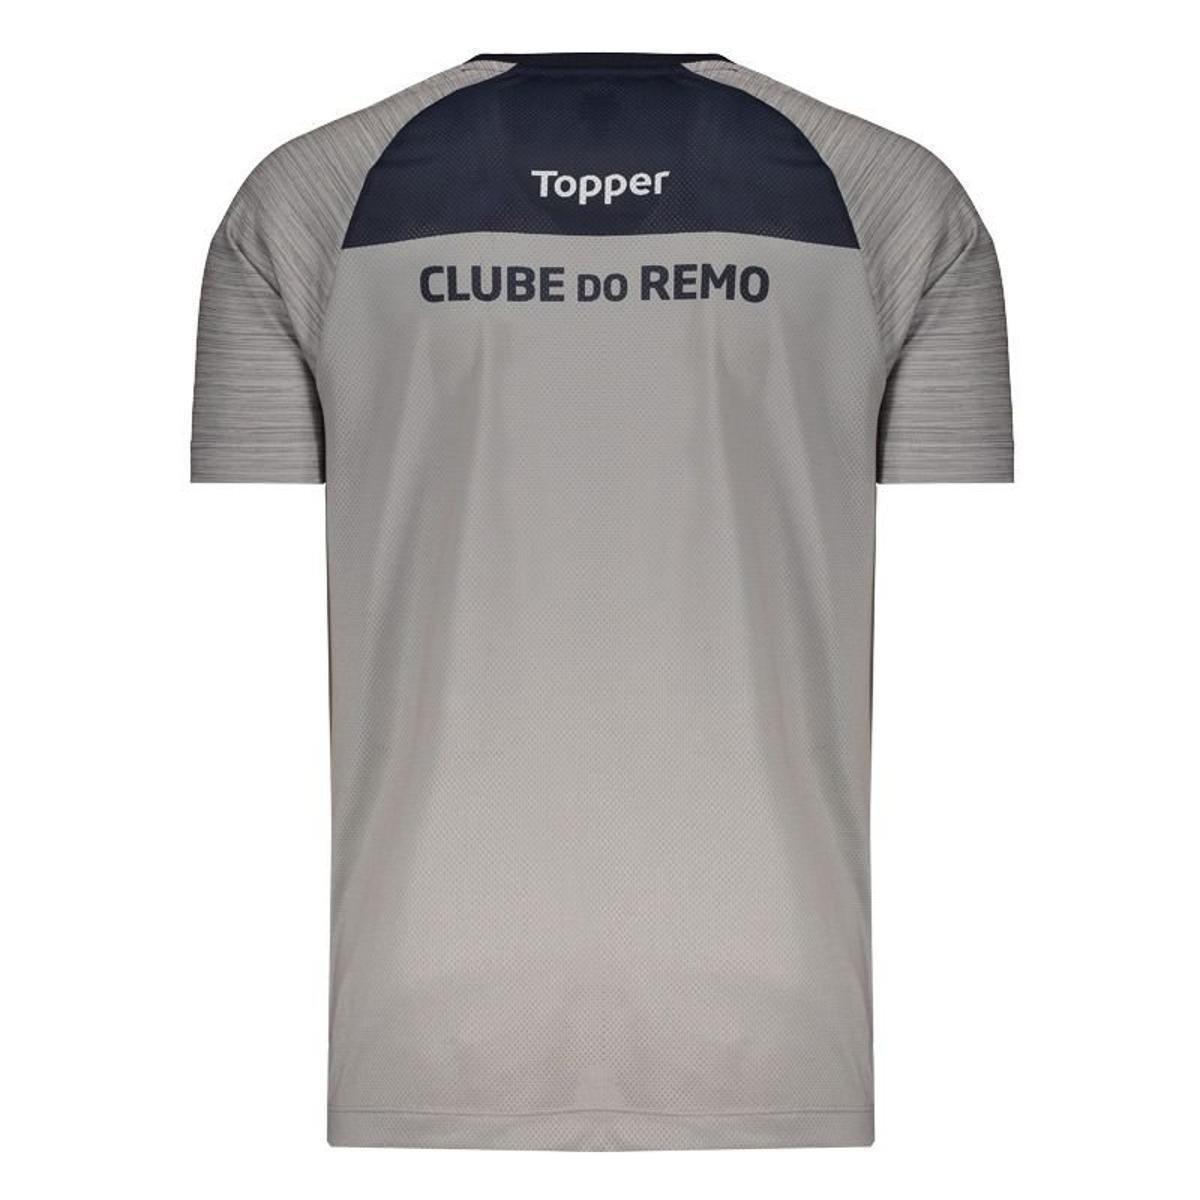 Camisa Topper Remo Treino Comissão Técnica 2018 Masculina - Cinza ... cdeaa73054c52